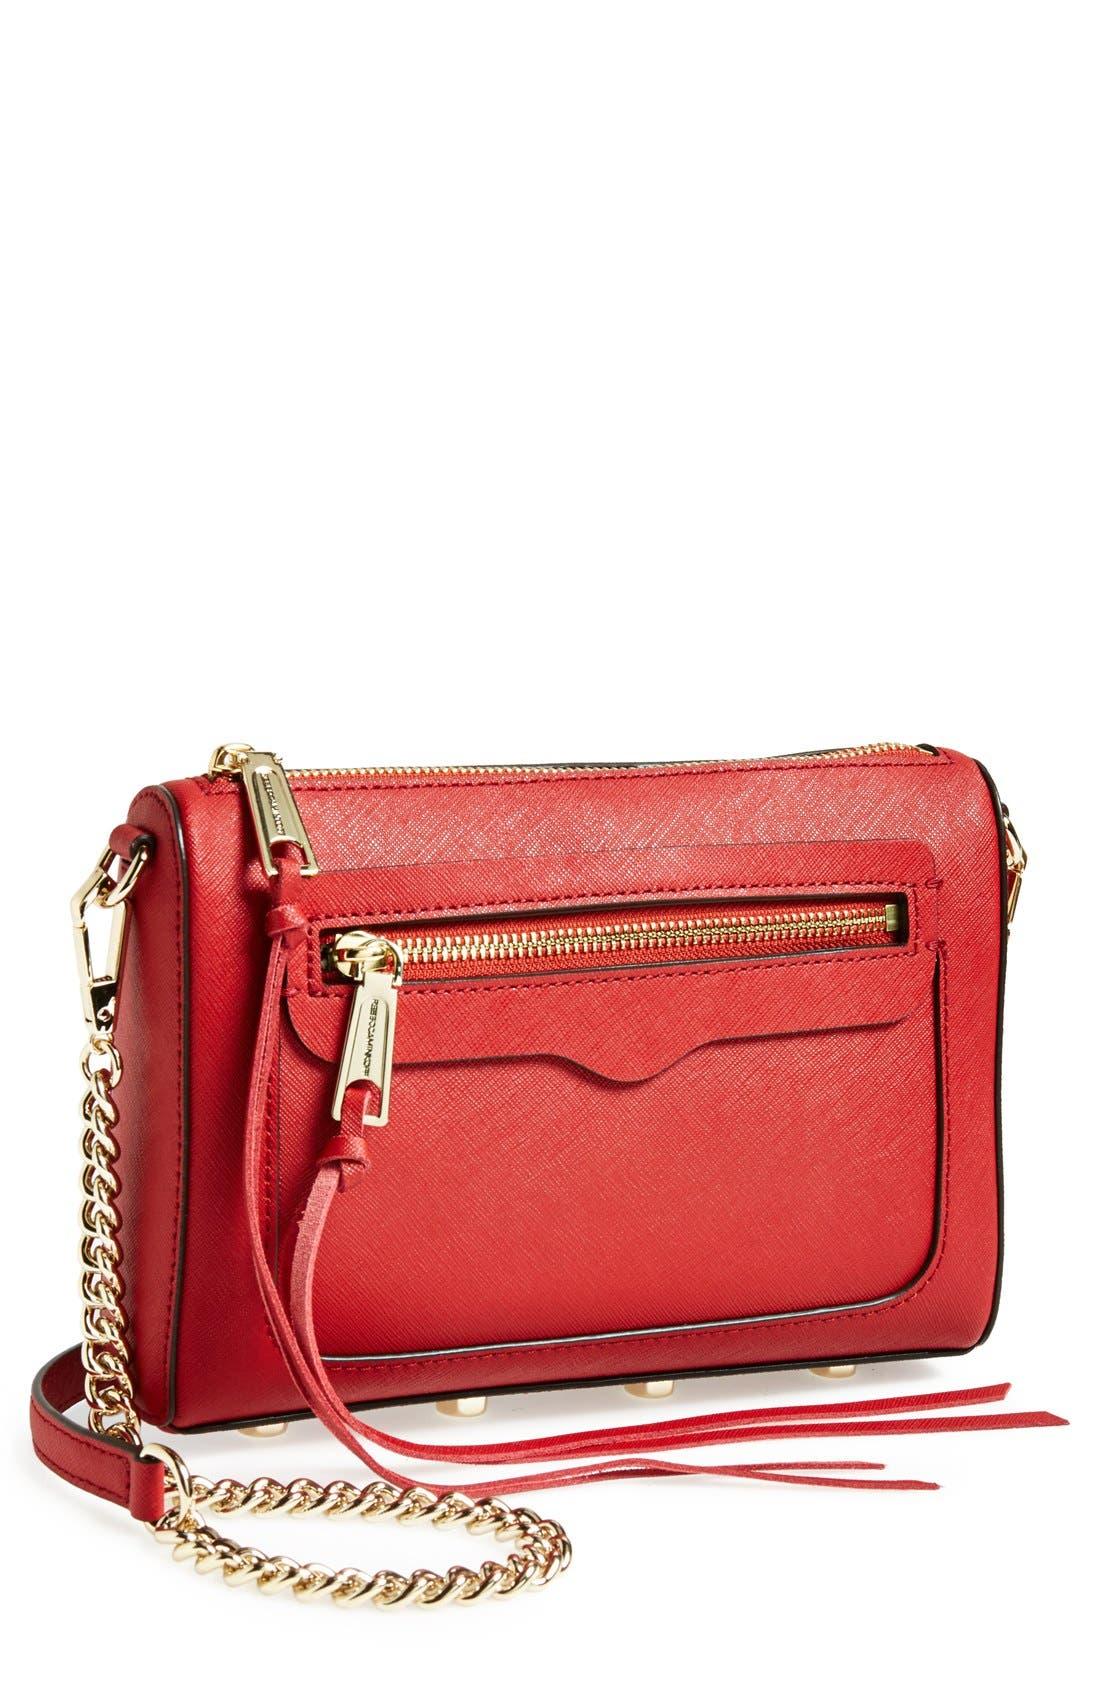 'Avery' Crossbody Bag,                             Main thumbnail 1, color,                             600